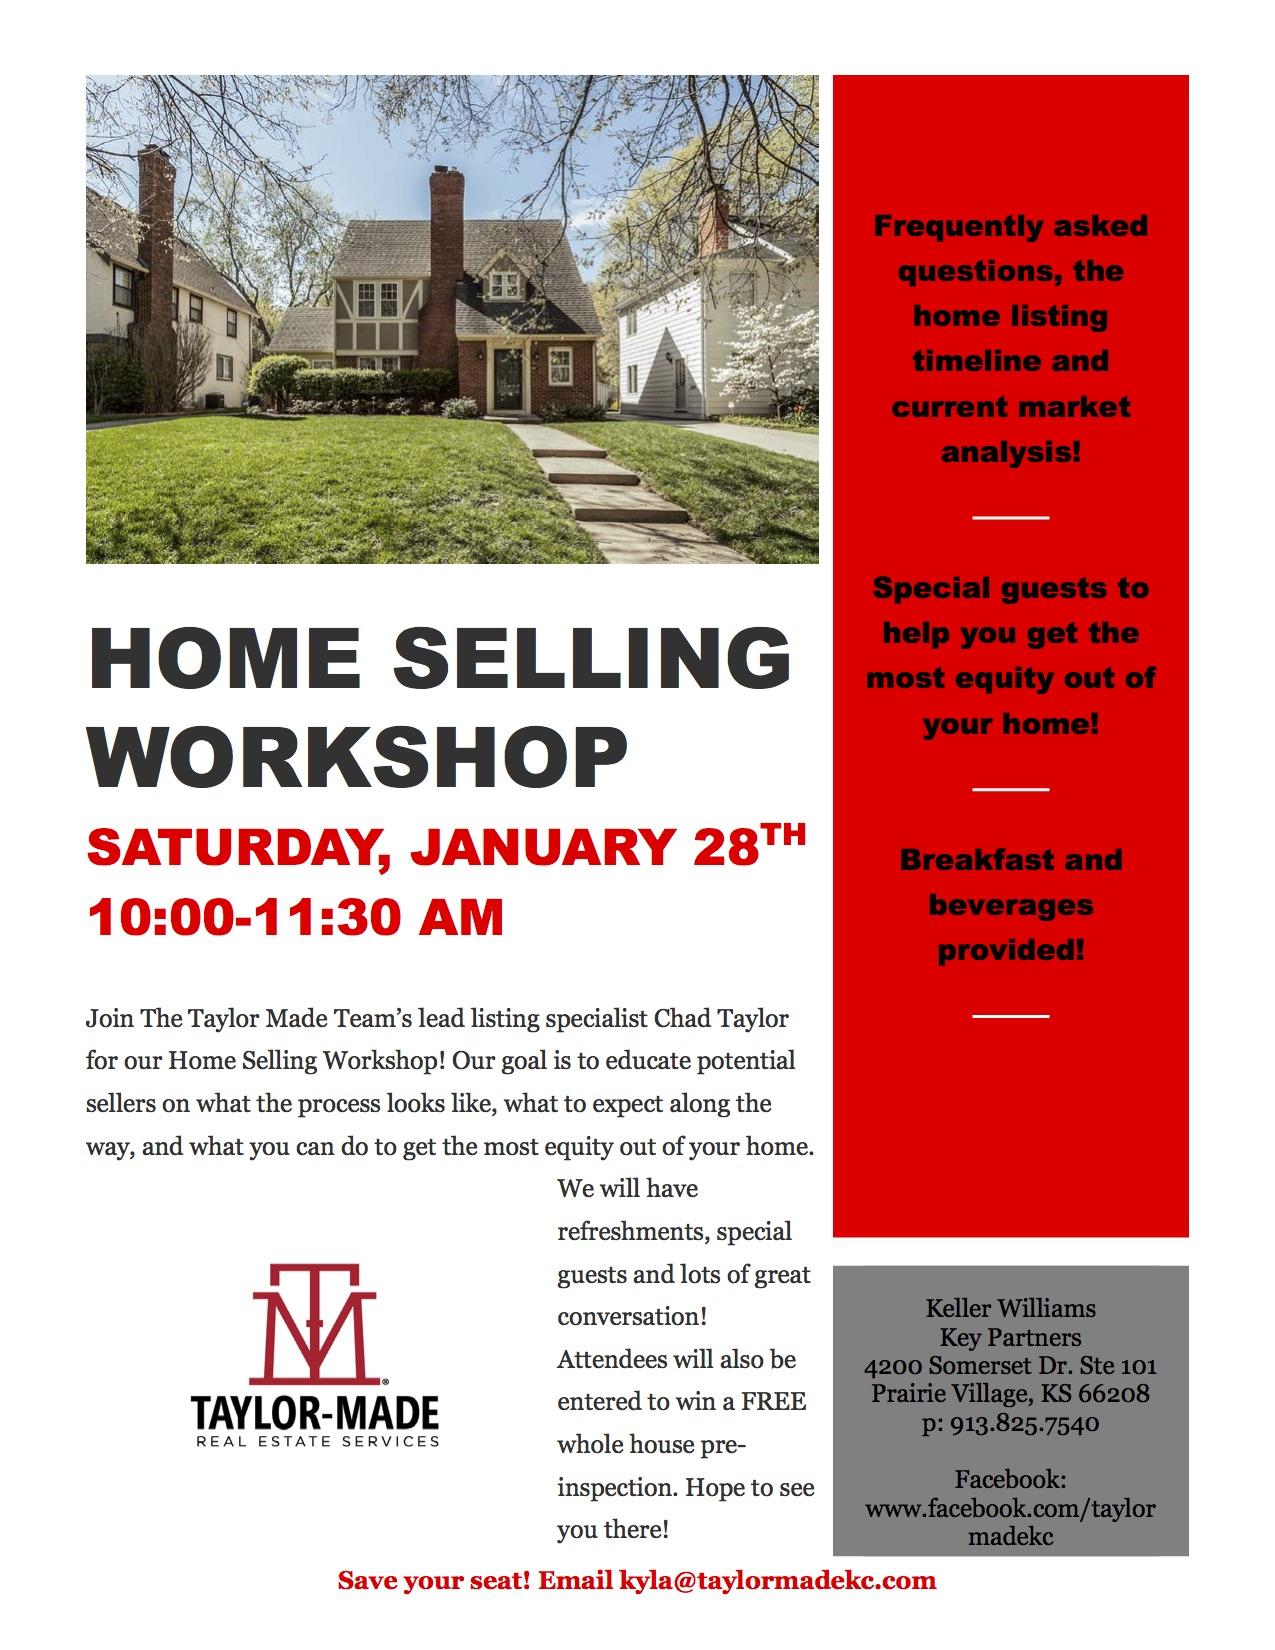 Home-Selling-Workshop-1-2017